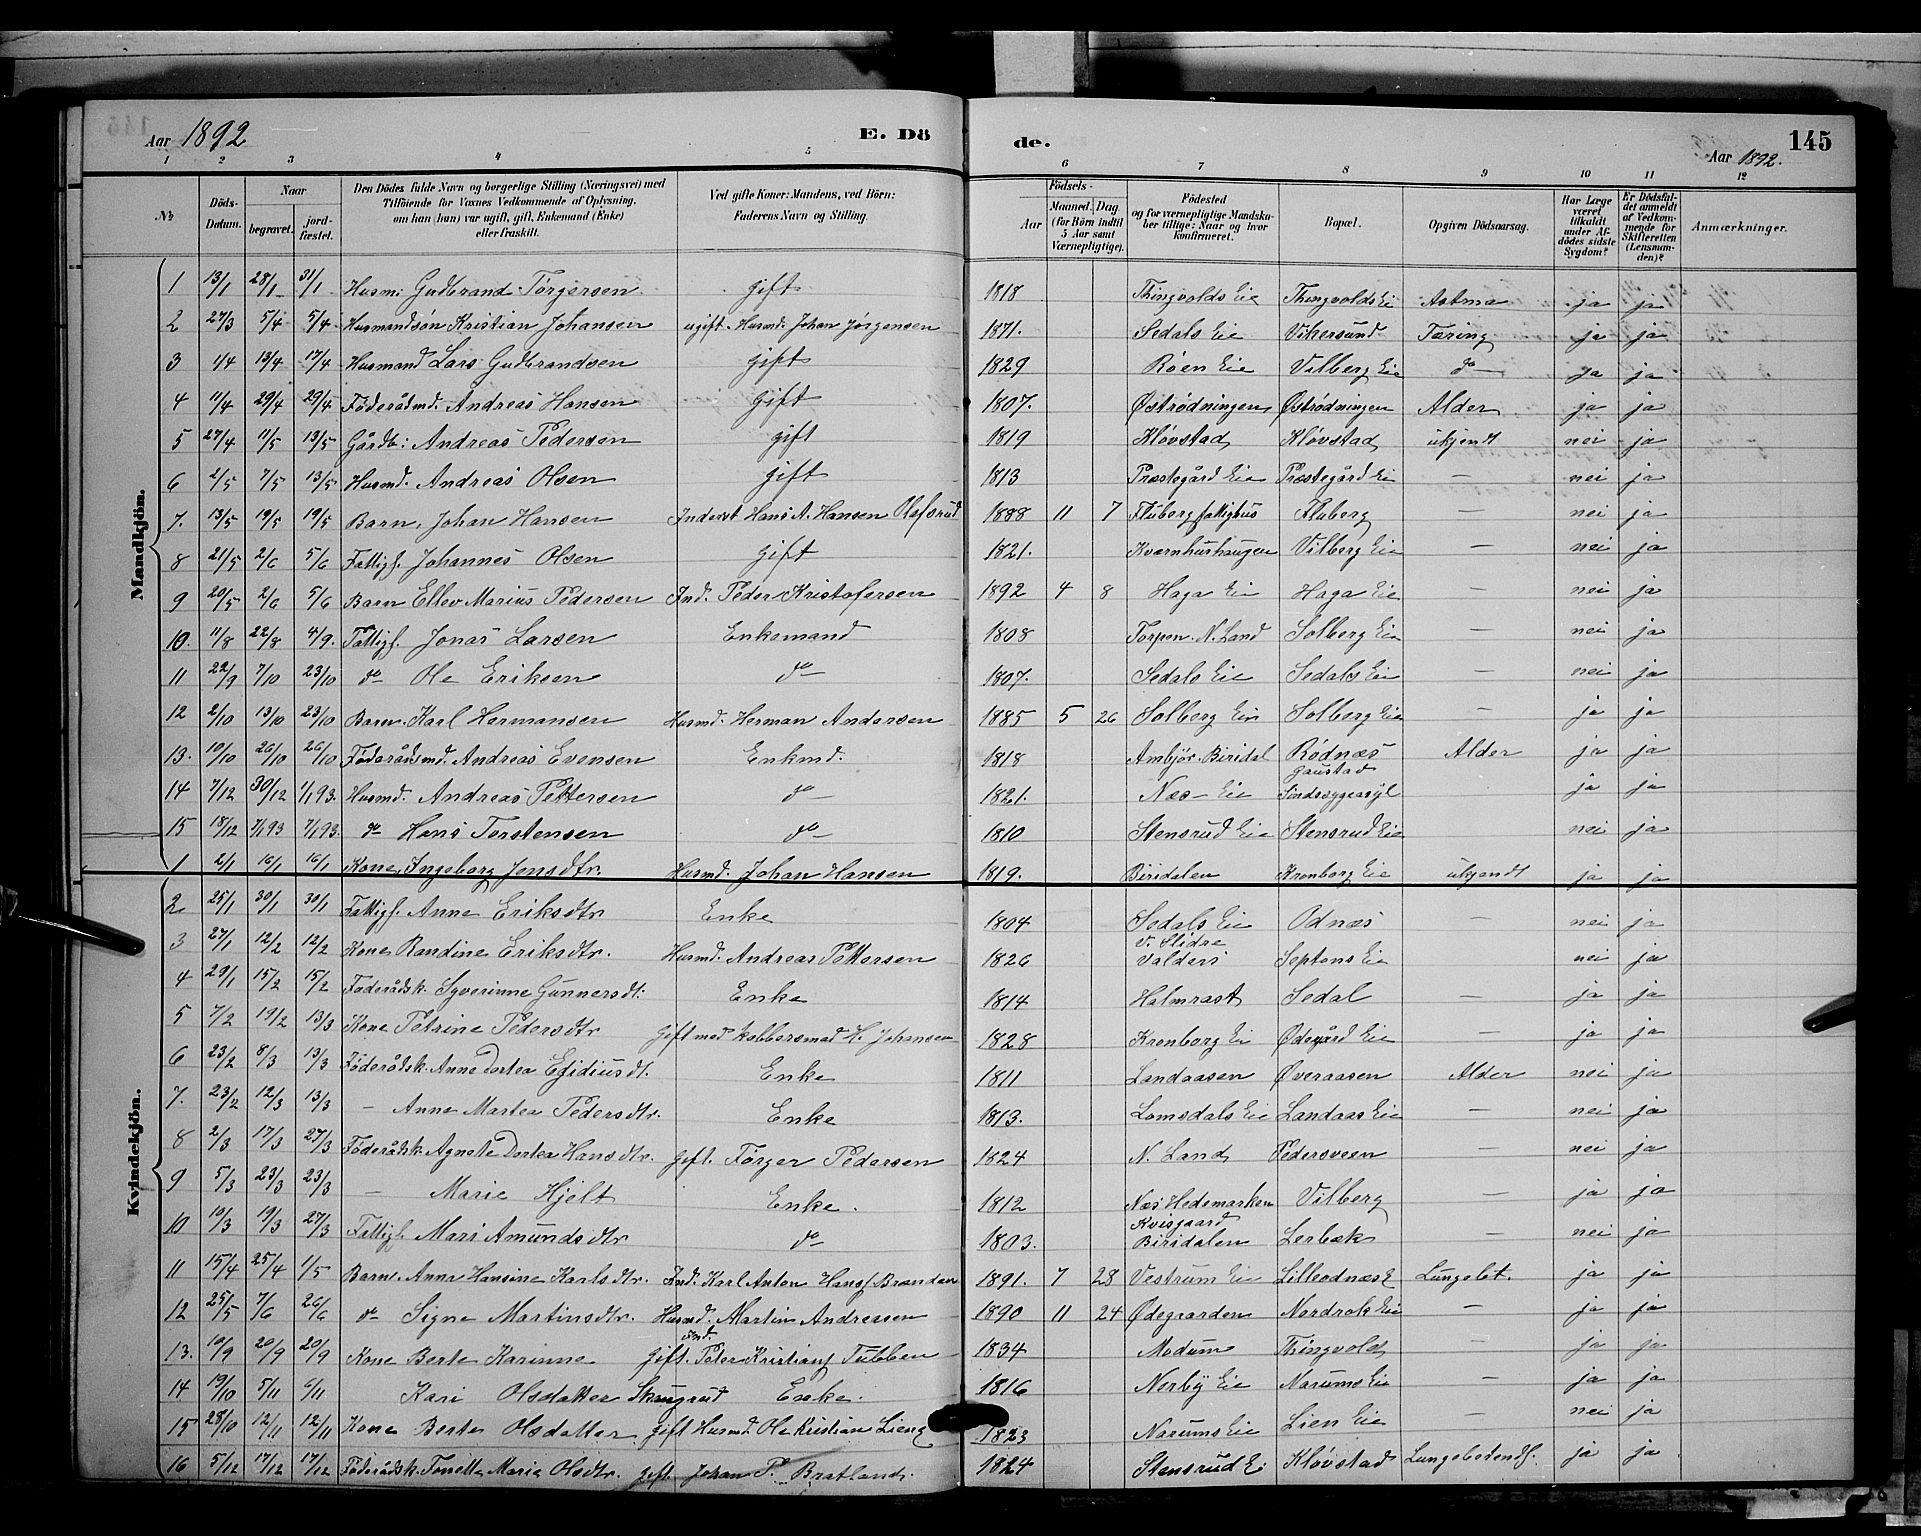 SAH, Søndre Land prestekontor, L/L0003: Klokkerbok nr. 3, 1884-1902, s. 145